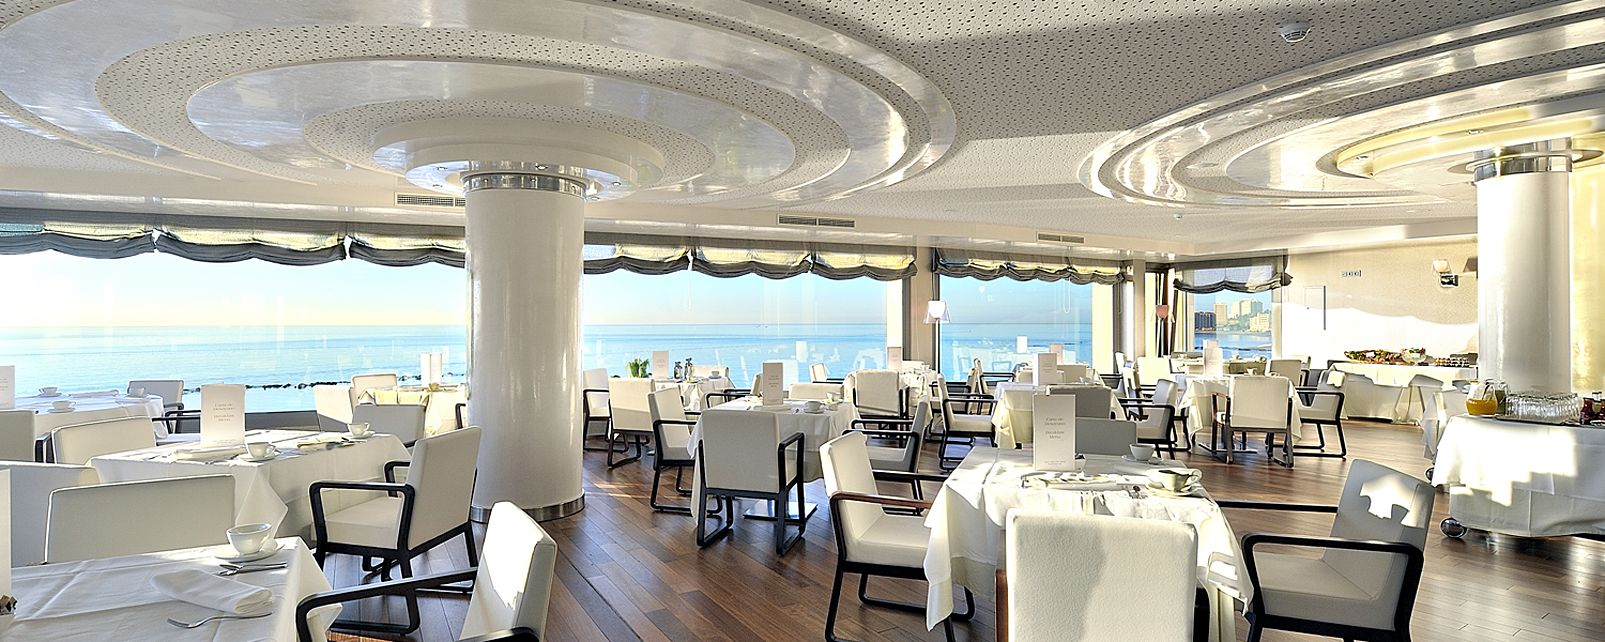 Hotel vincci seleccion aleysa boutique spa in benalm dena for Boutique spa hotels uk